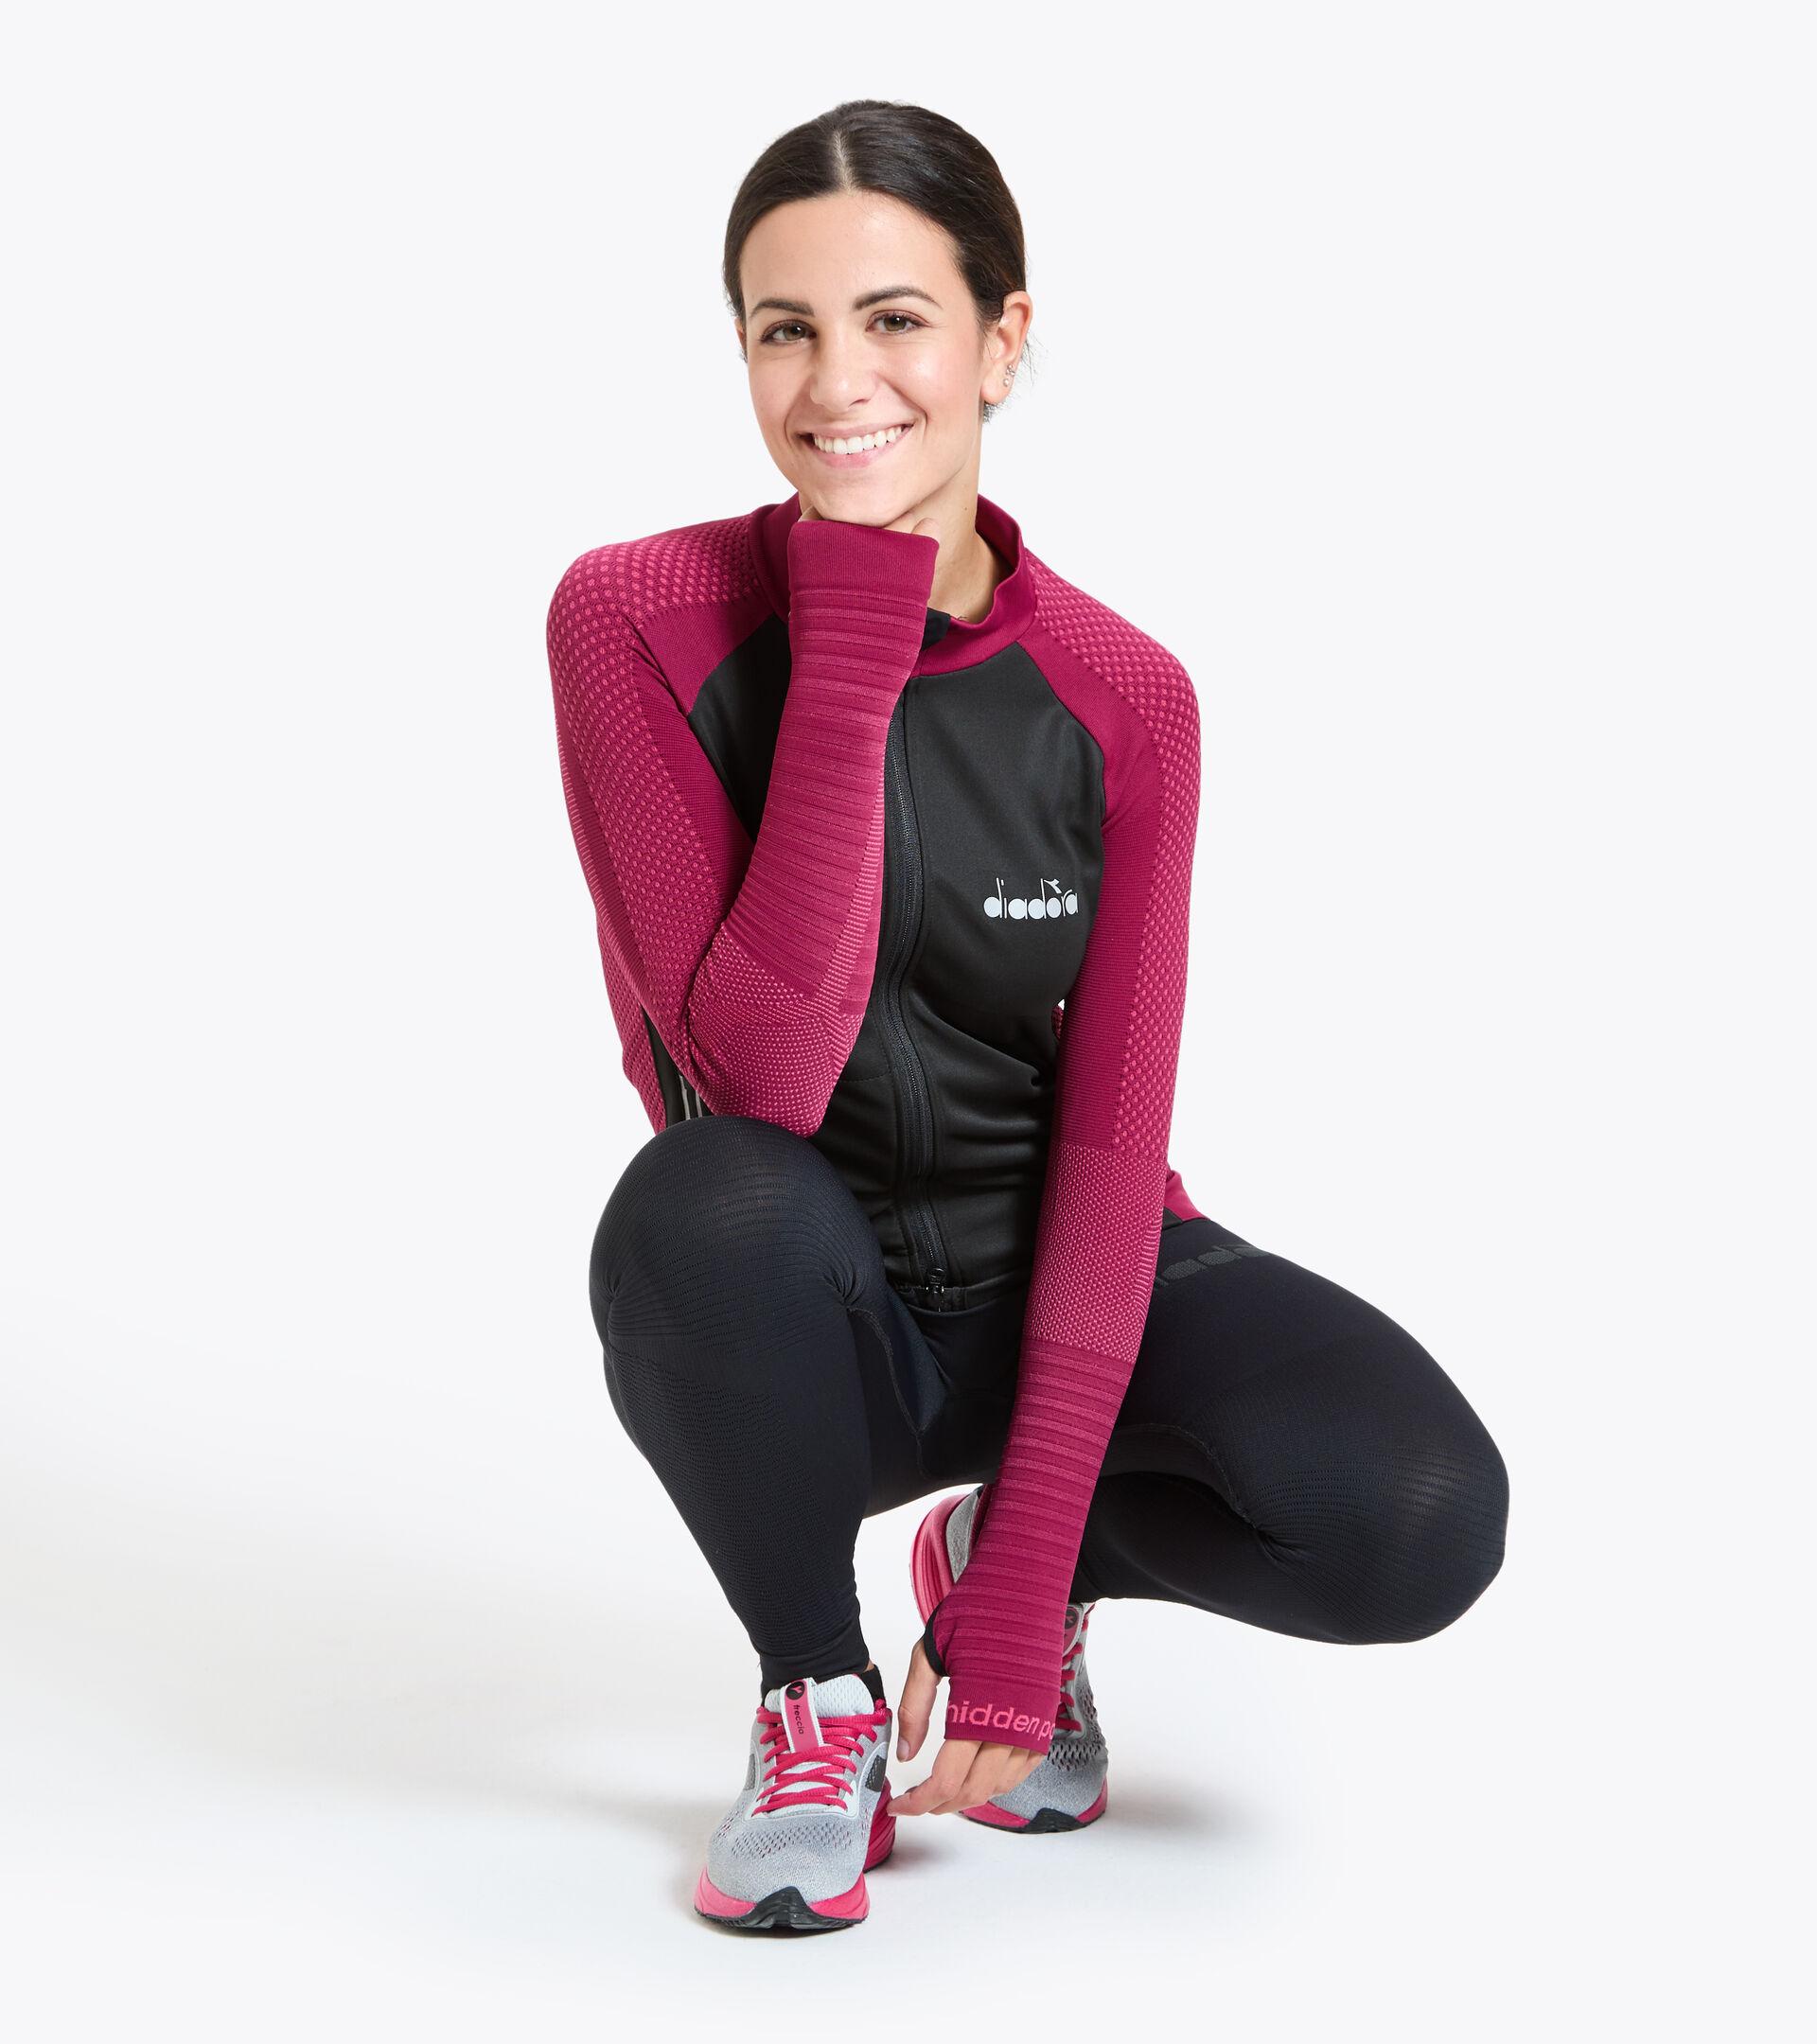 Chaqueta para correr Made in Italy - Mujer L. HIDDEN POWER JACKET RODODENDRO - Diadora